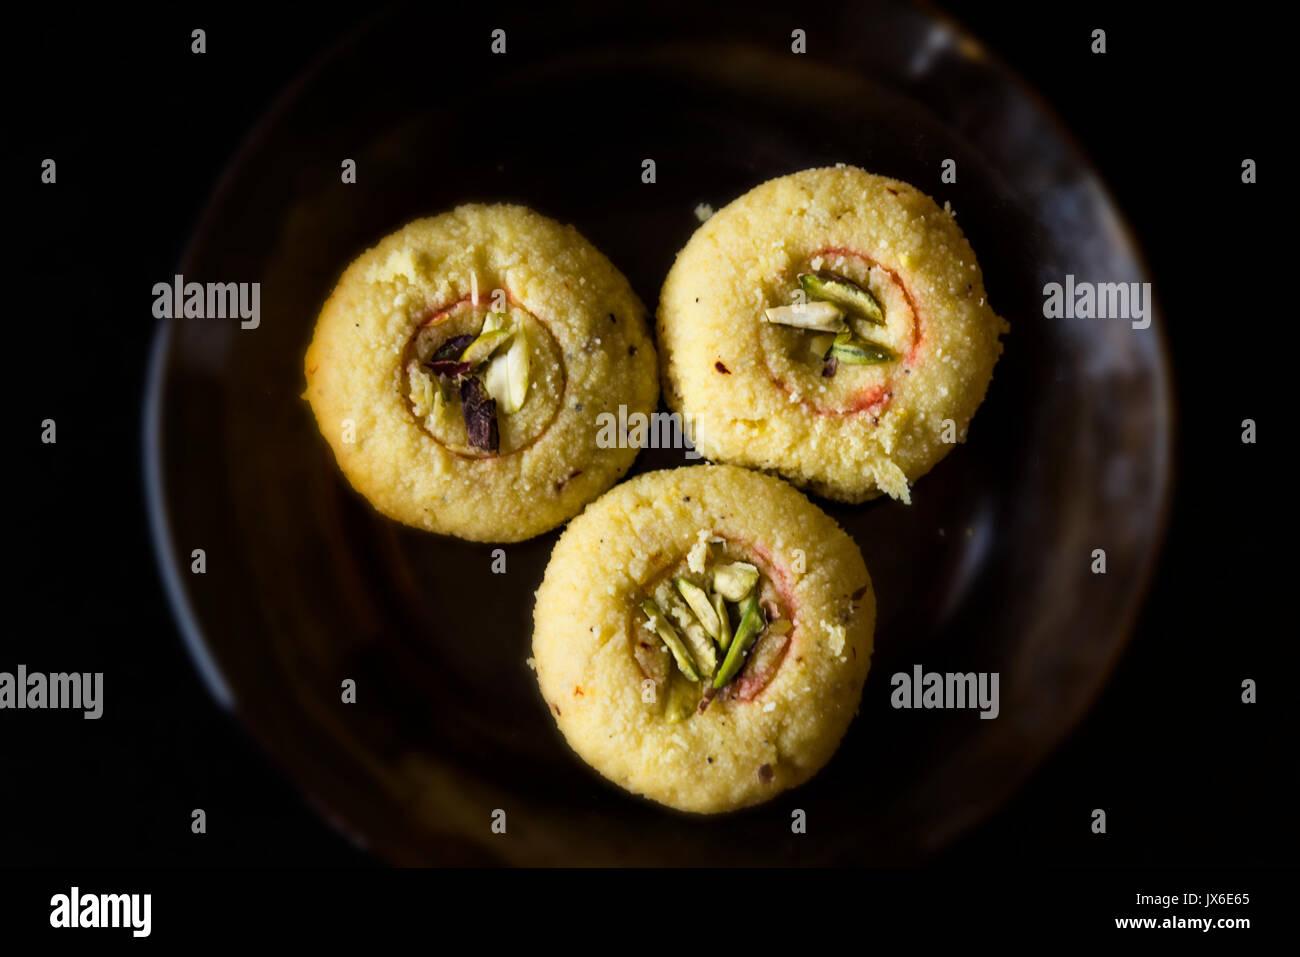 Indian Sweet, Kesar (Saffron) Peda with Garnishing of Pistachio and Cardamom - Stock Image